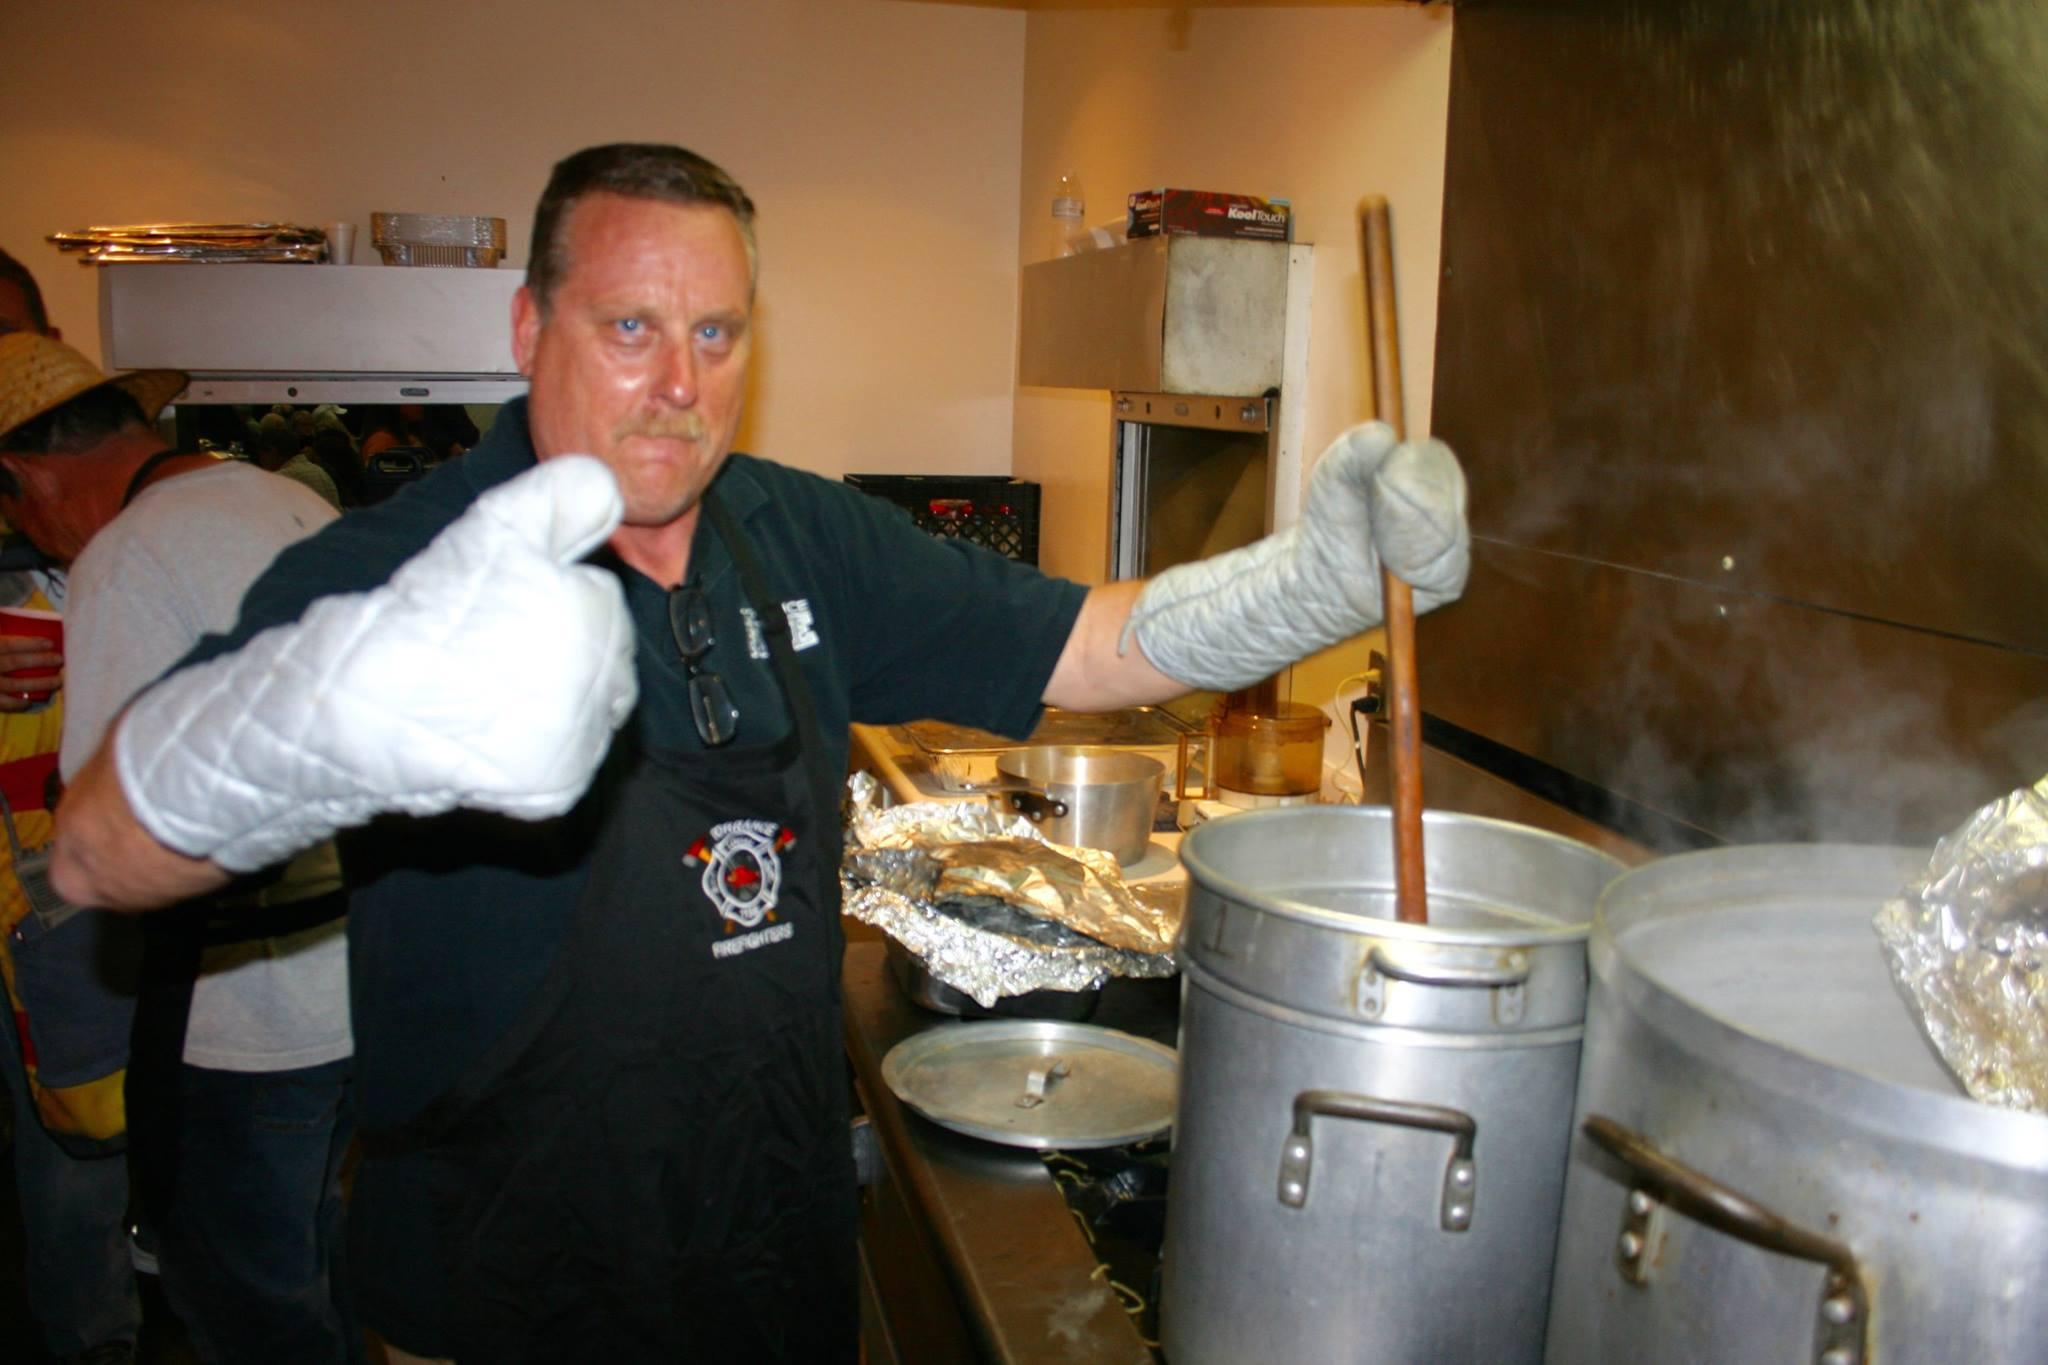 The Torrance Firefighters Association's Benefit Spaghetti Dinner